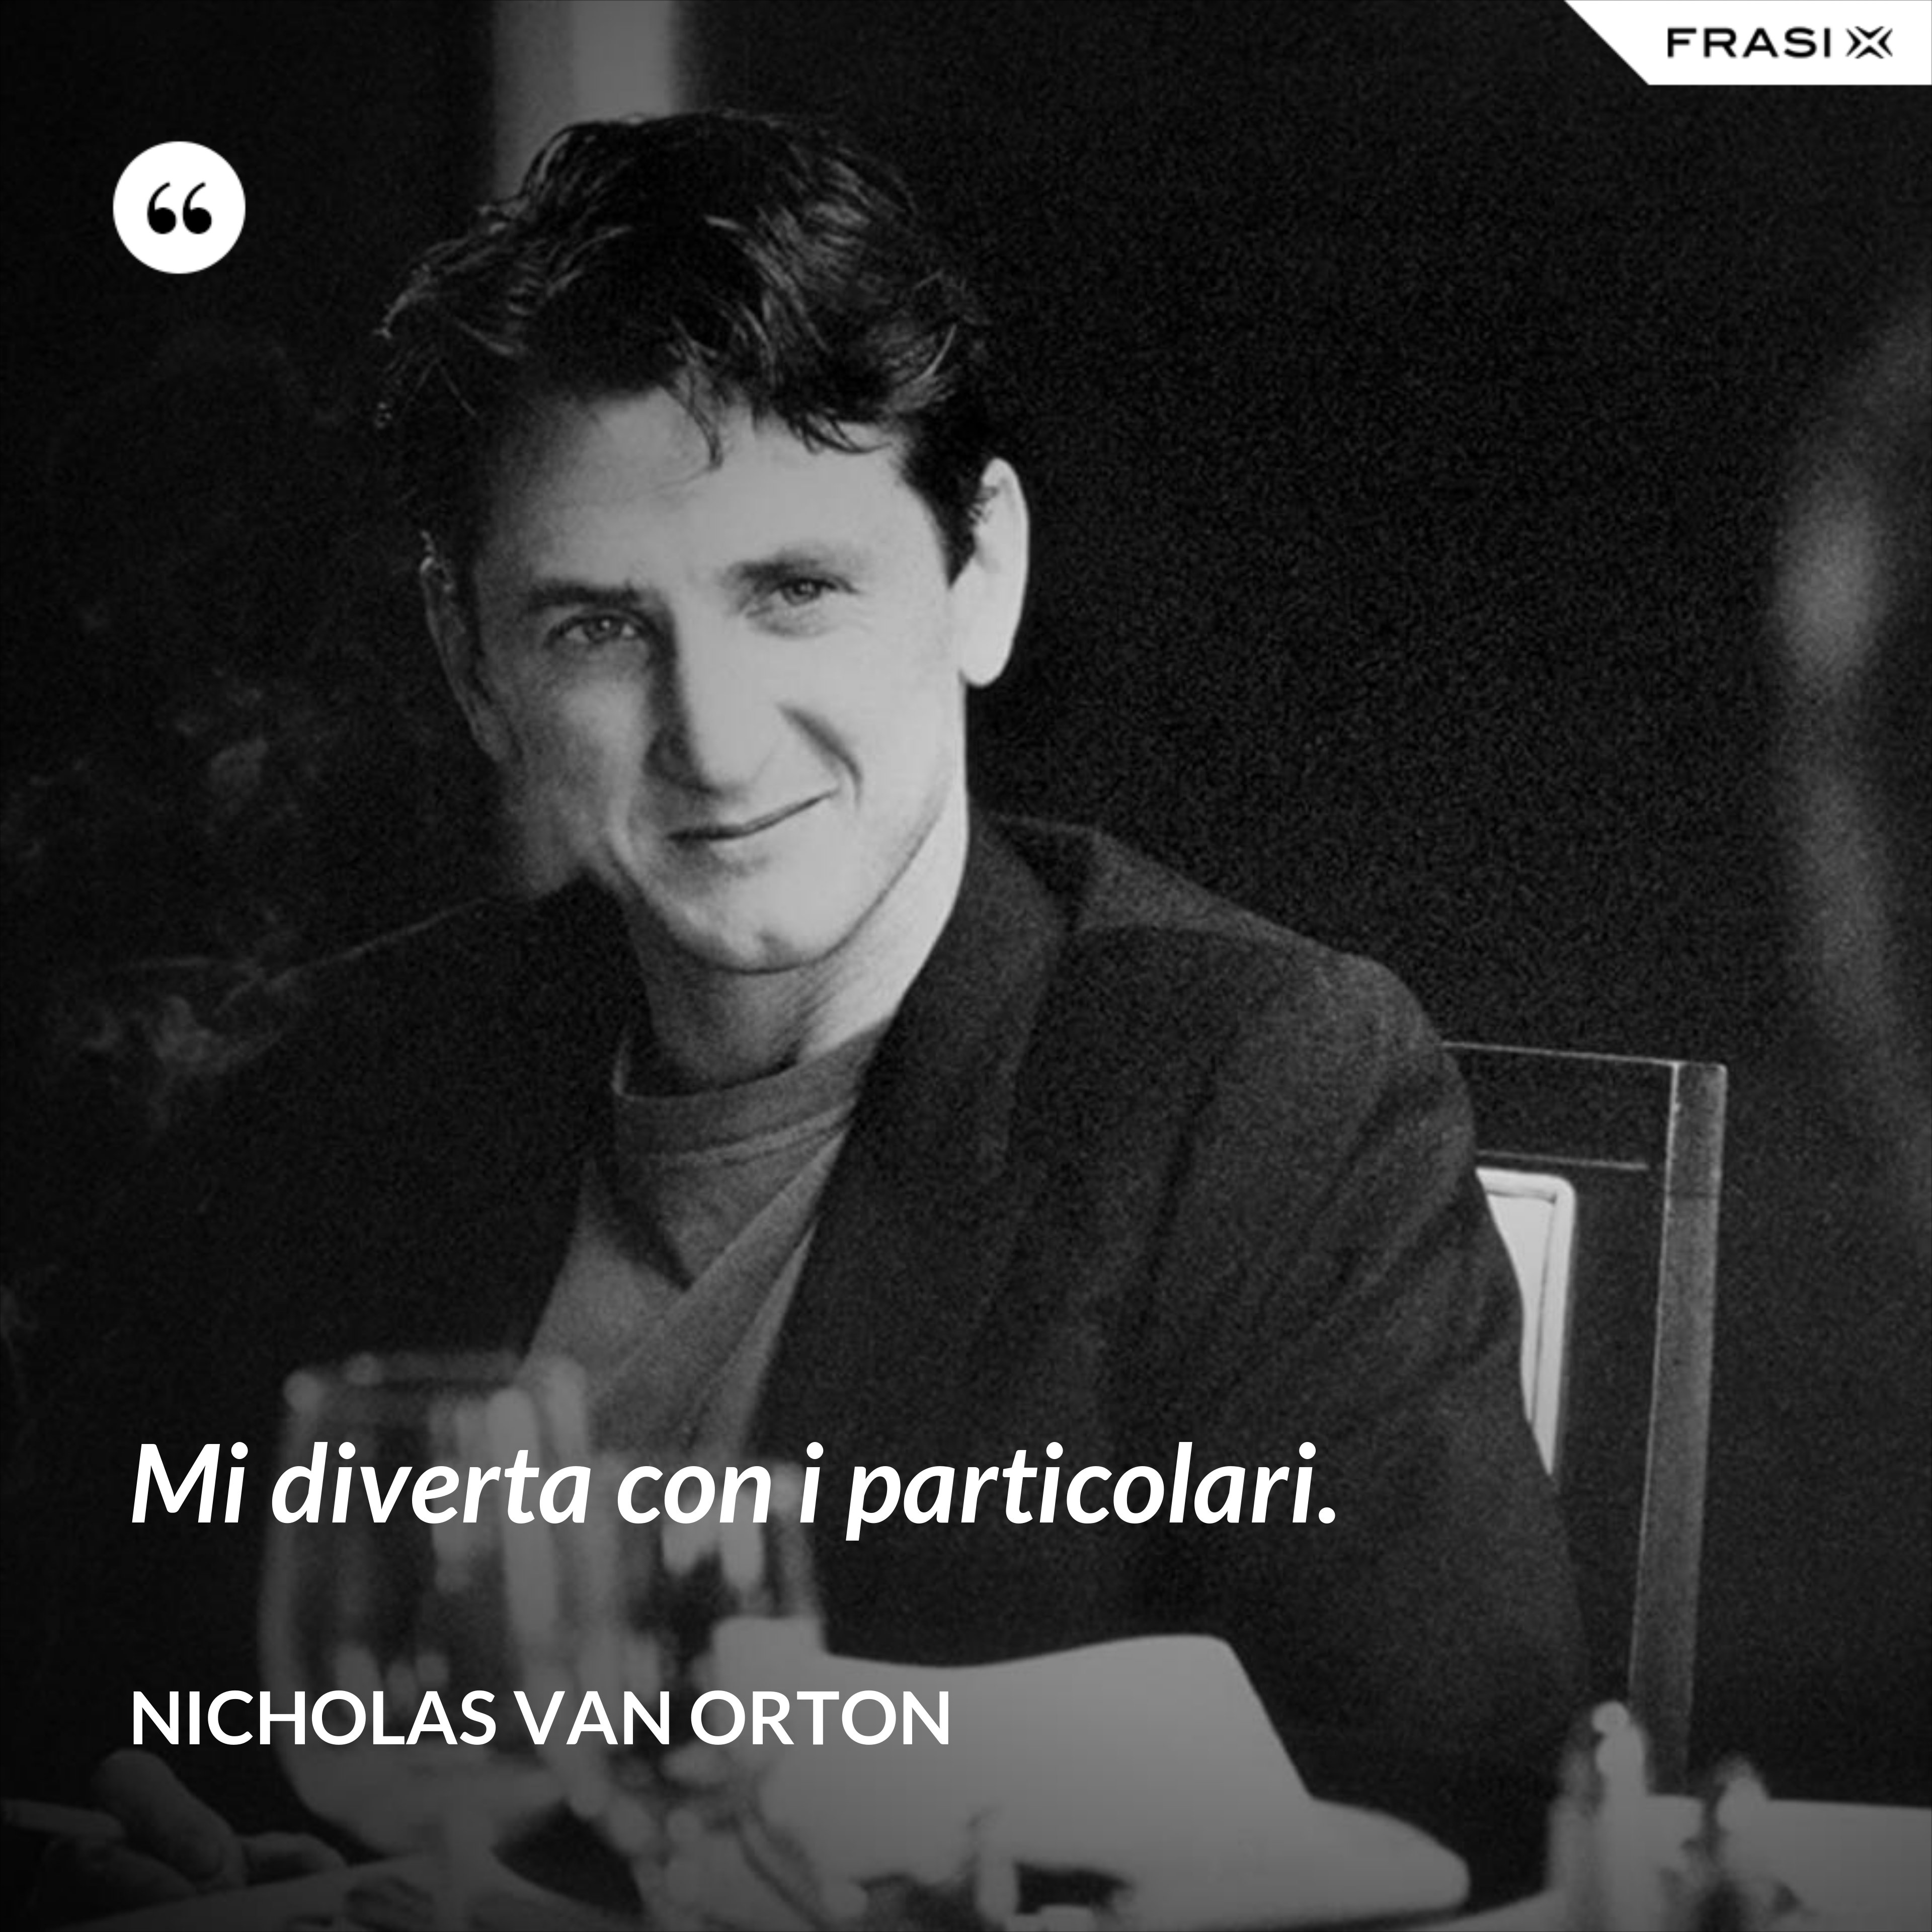 Mi diverta con i particolari. - Nicholas Van Orton